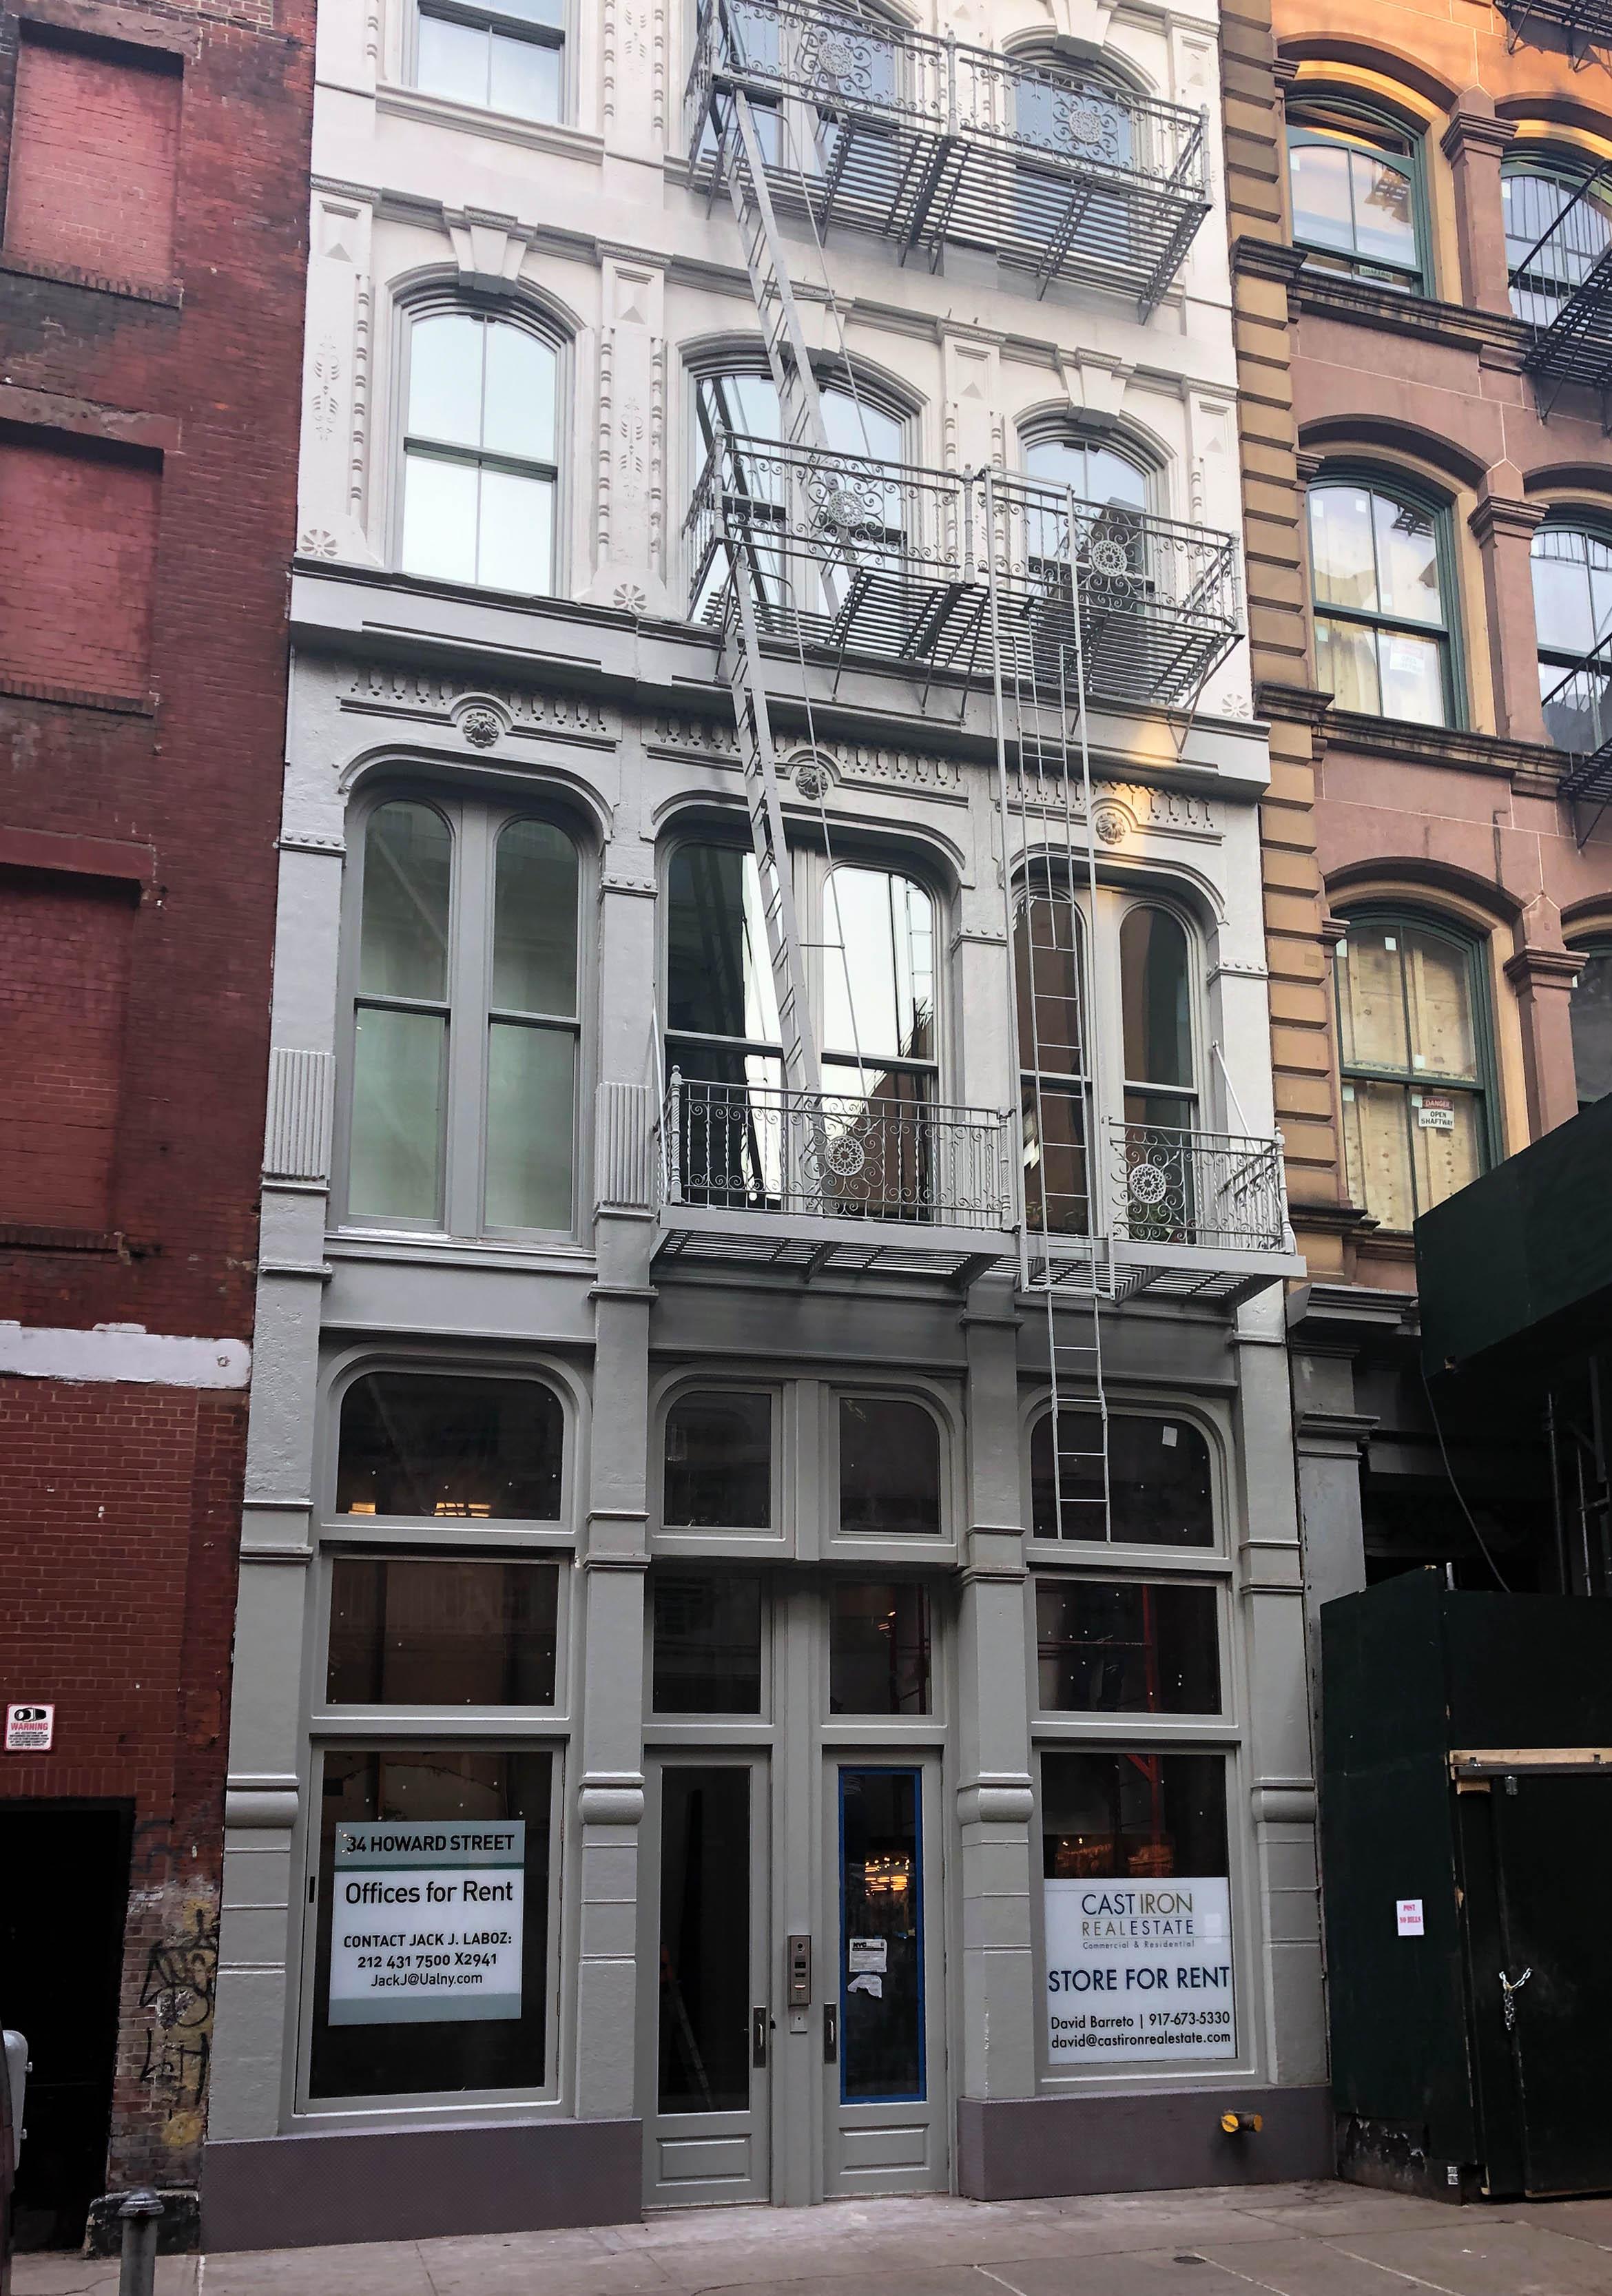 34 Howard Street